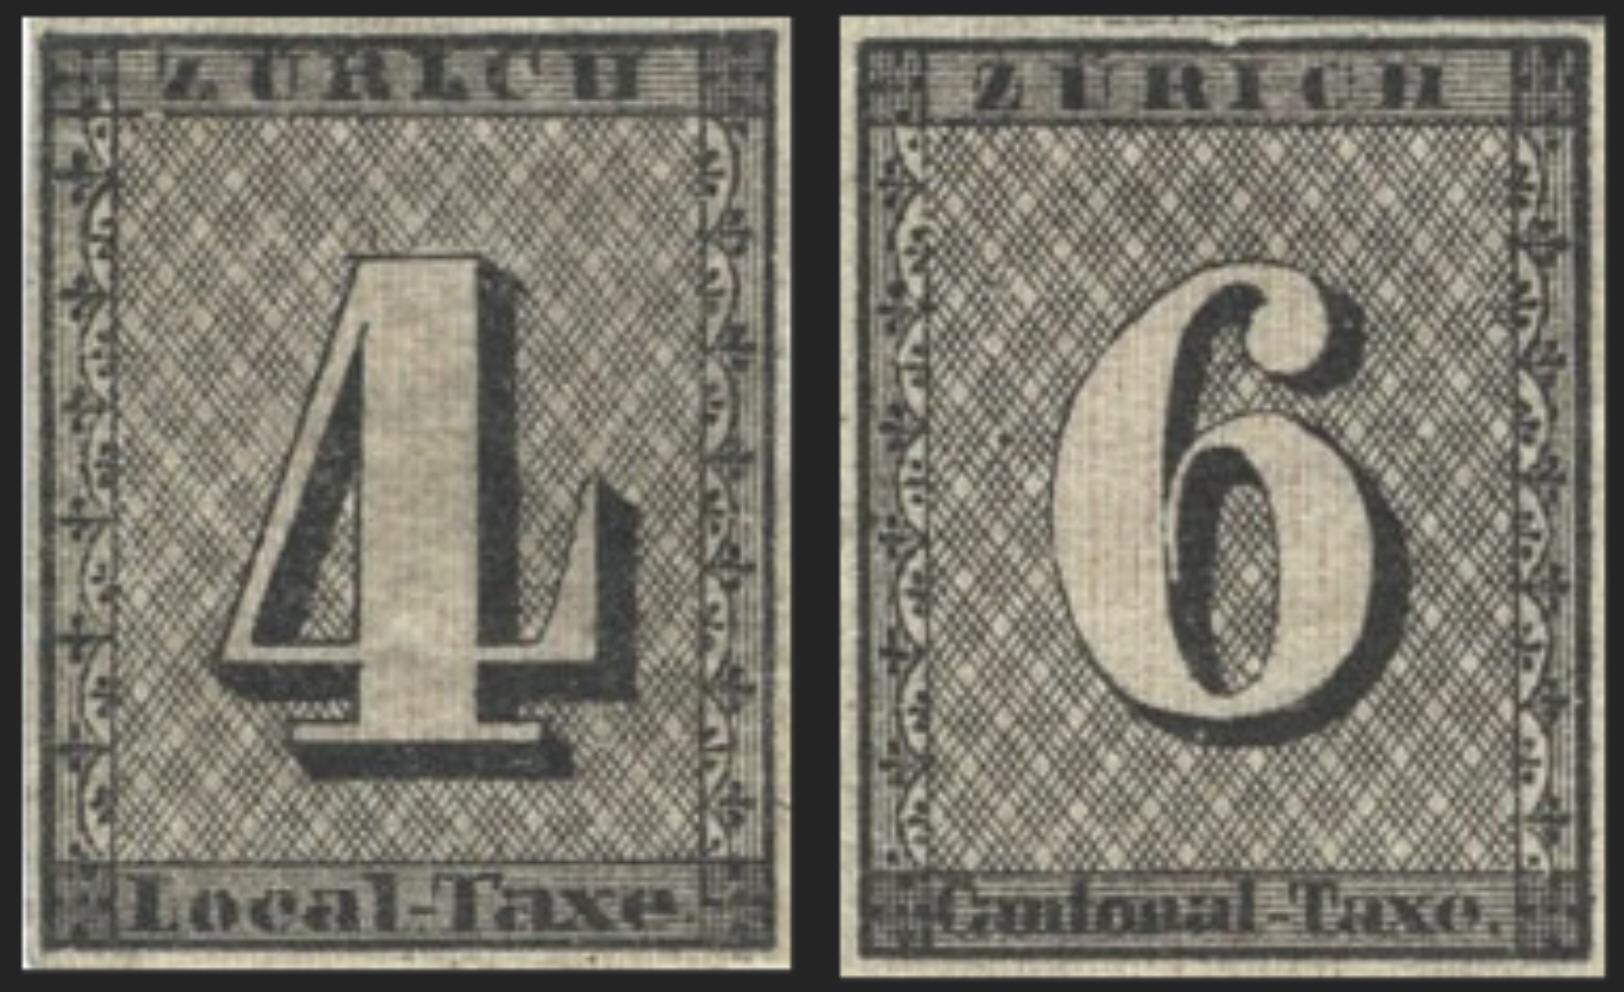 Monochrome image of the Zürich 4 and 6 [NIMC, source: Wikipedia]